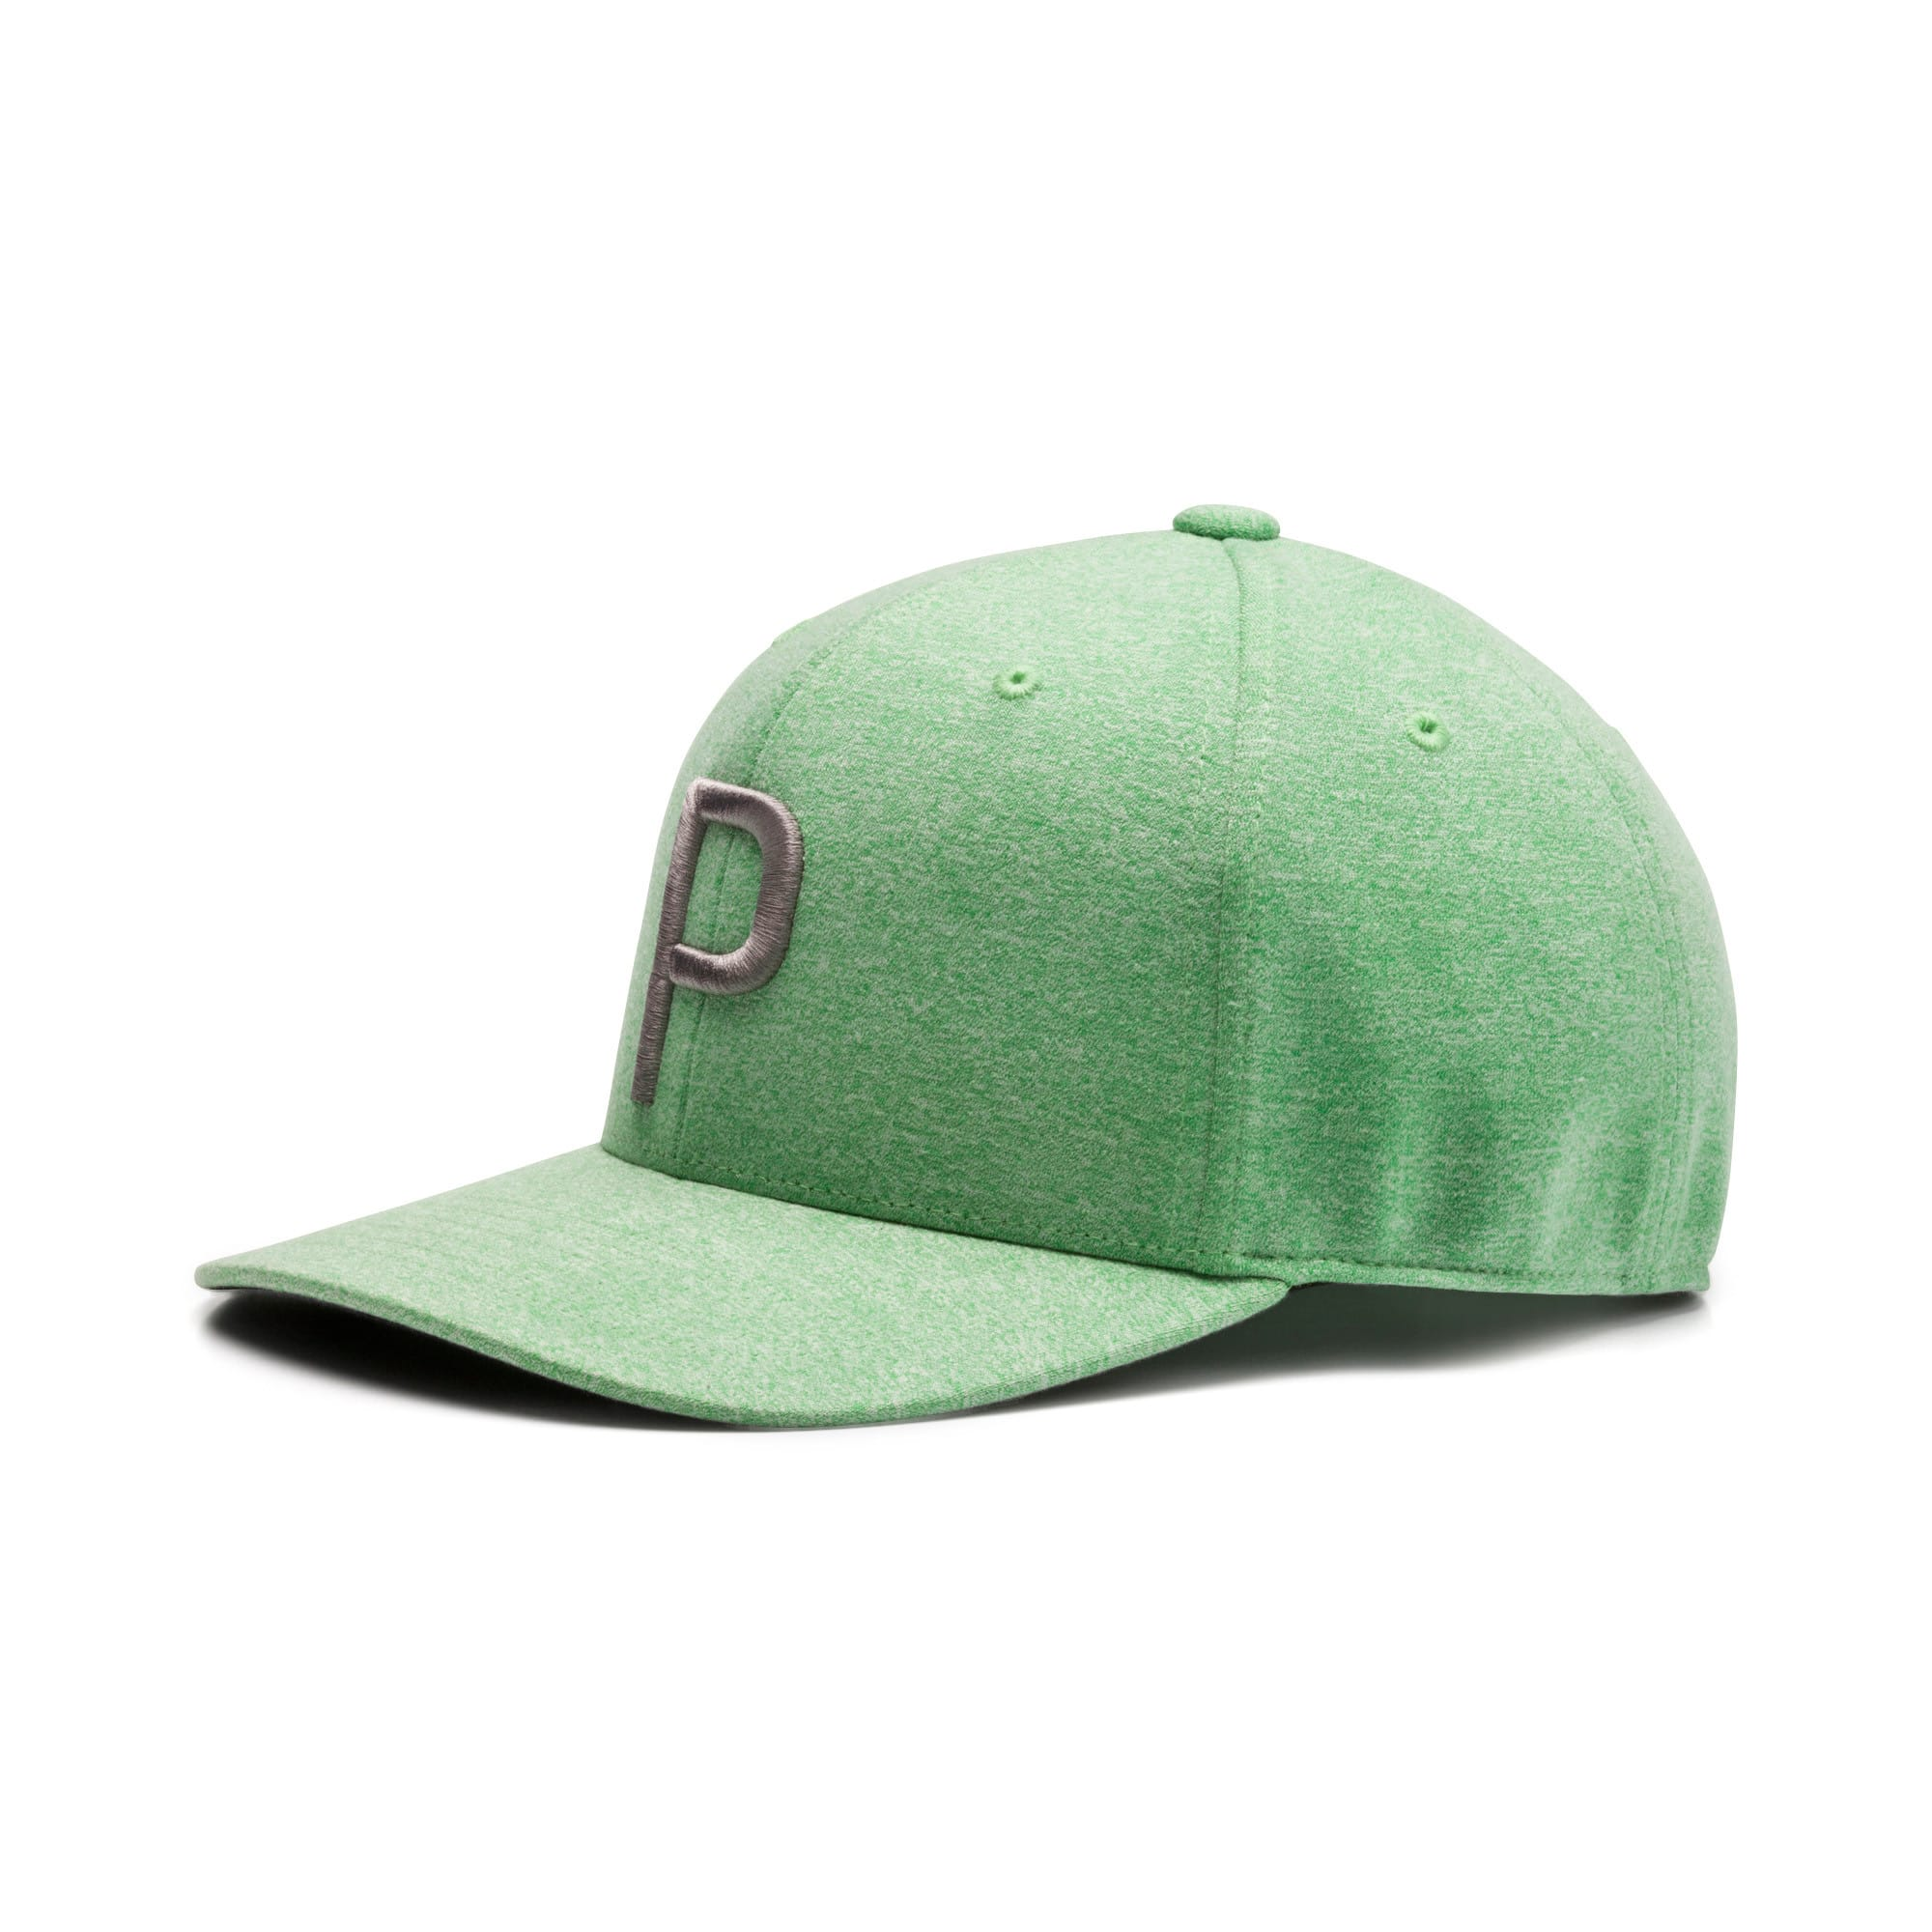 Thumbnail 1 of ゴルフ Pマークスナップバックキャップ, Irish Green, medium-JPN